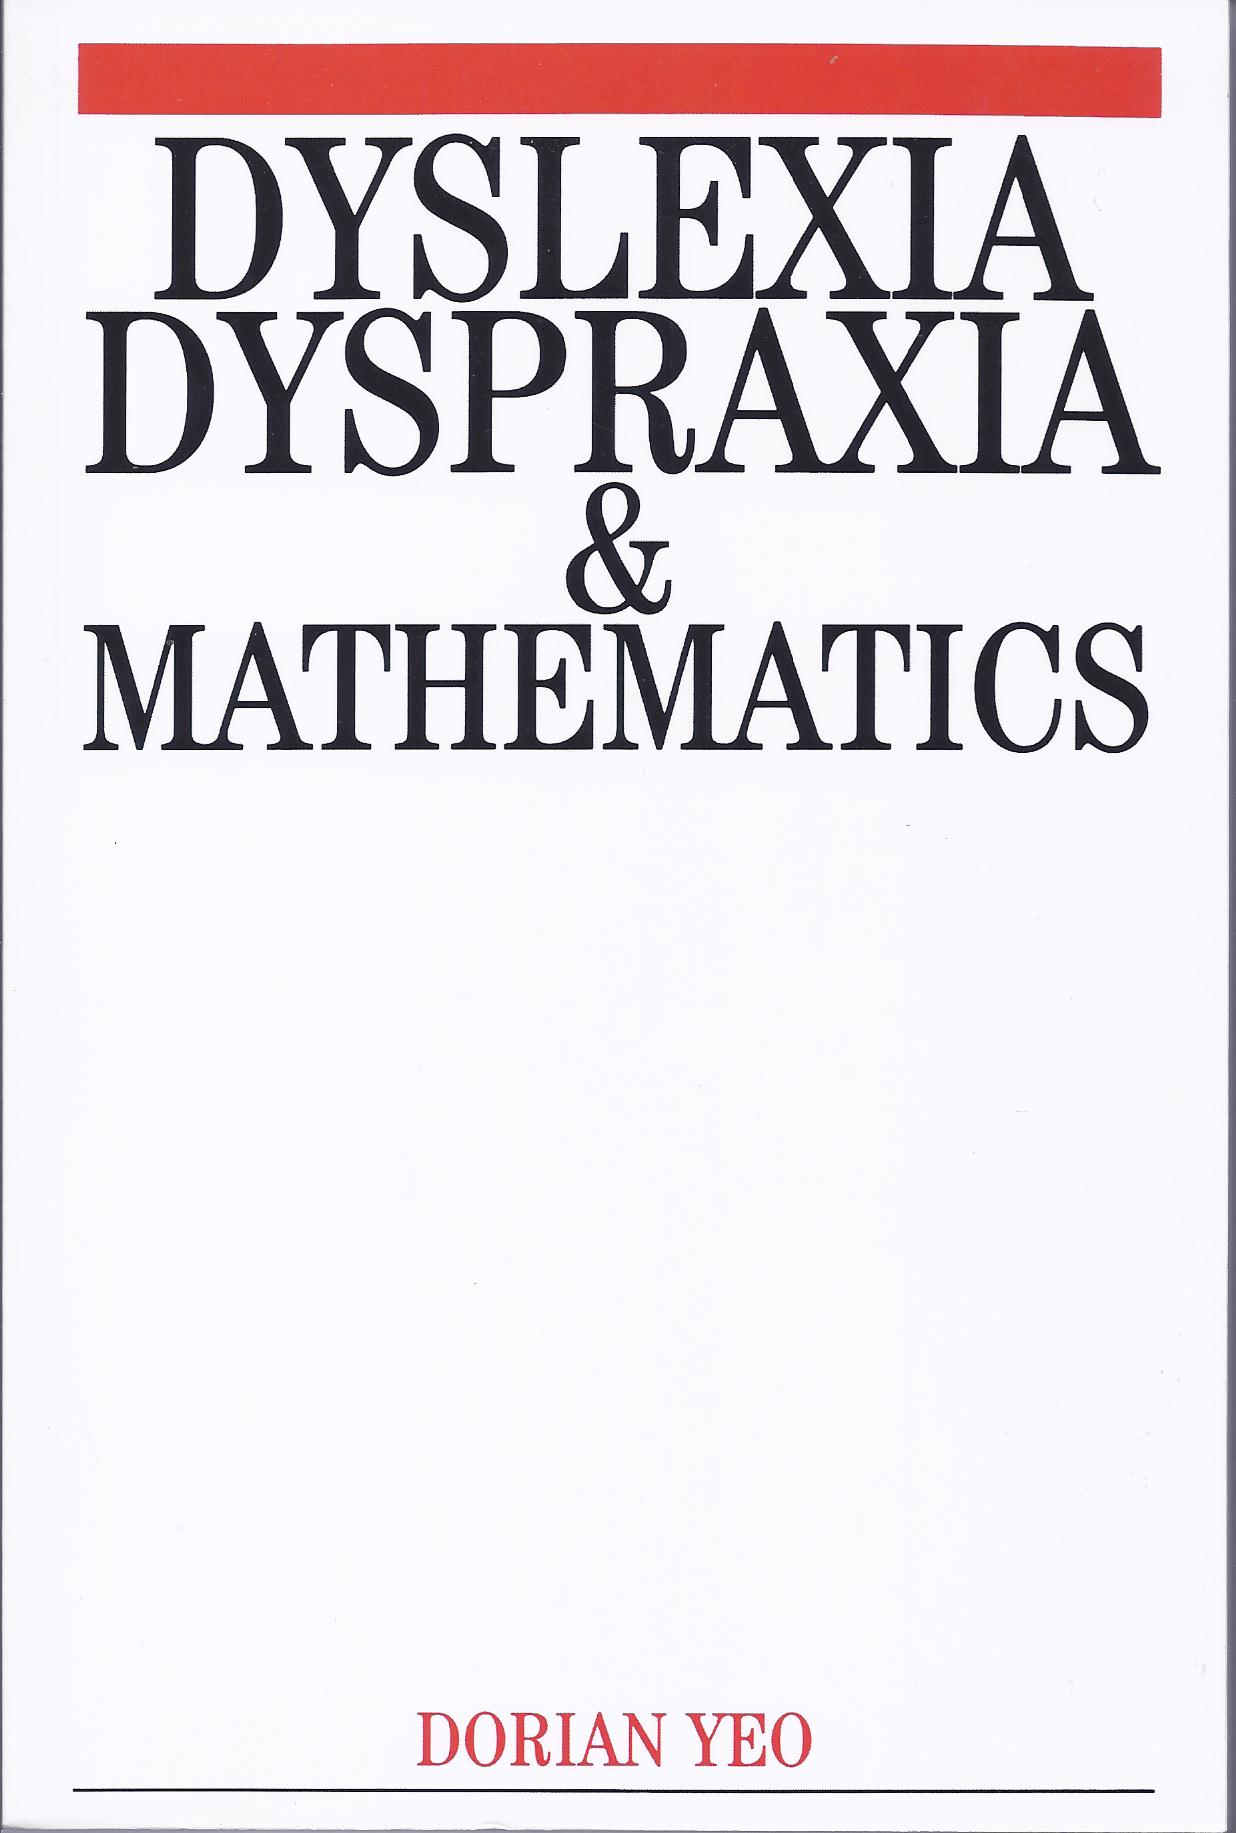 Dyslexia, Dyspraxia and Mathematics by Dorian Yeo-0